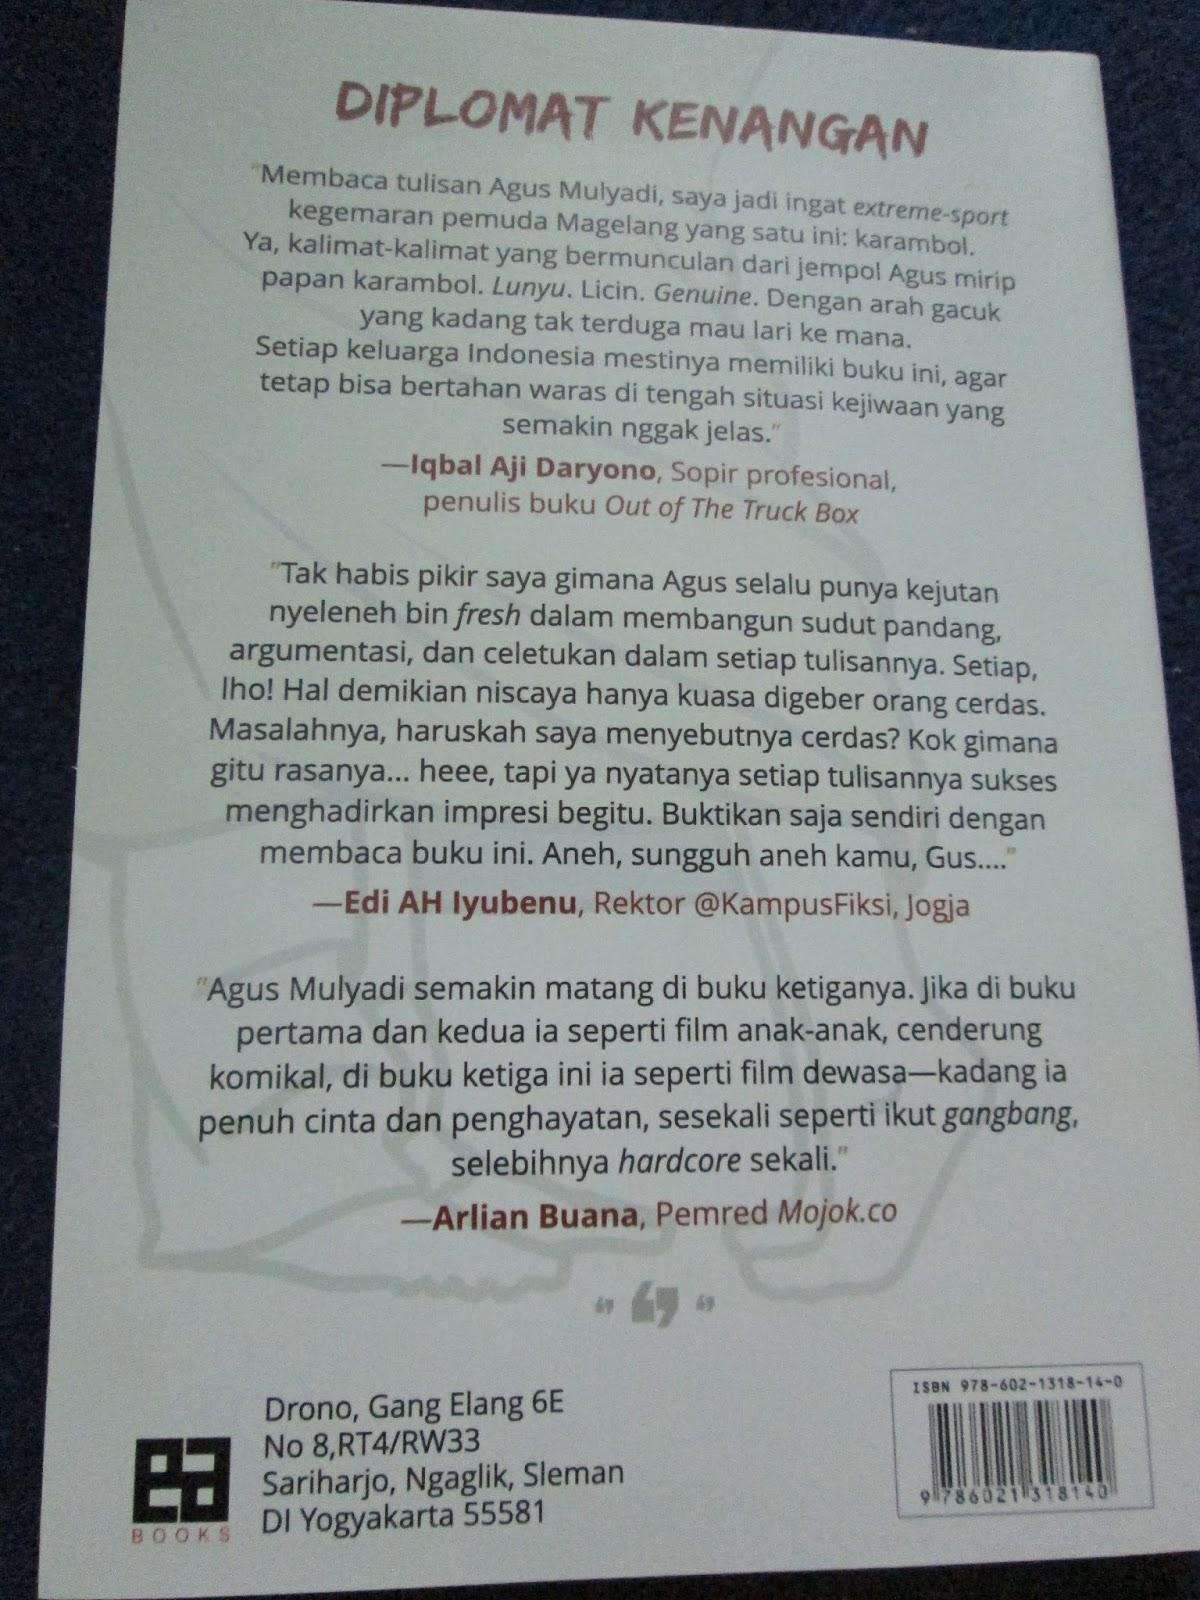 Bagian belakang buku Diplomat Kenangan